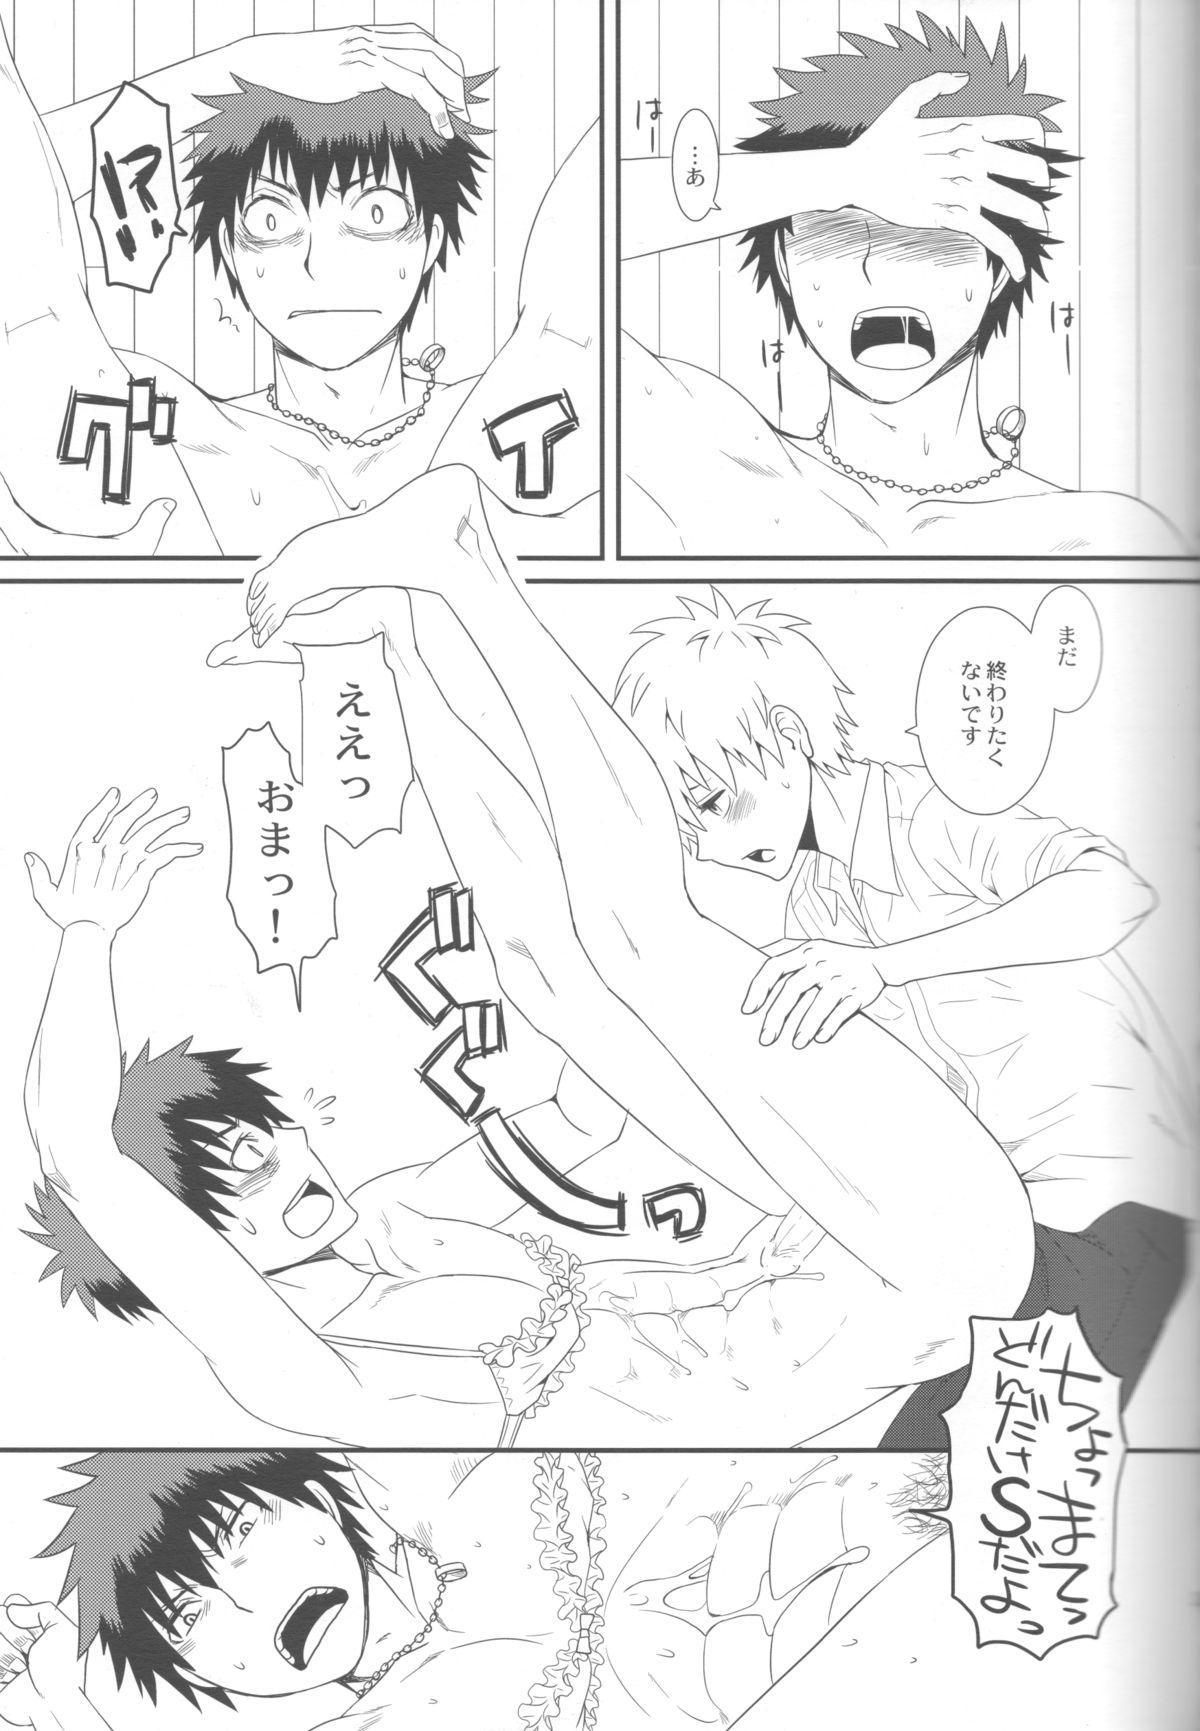 Kuroko to Kagami to Tokidoki Nigou to 21